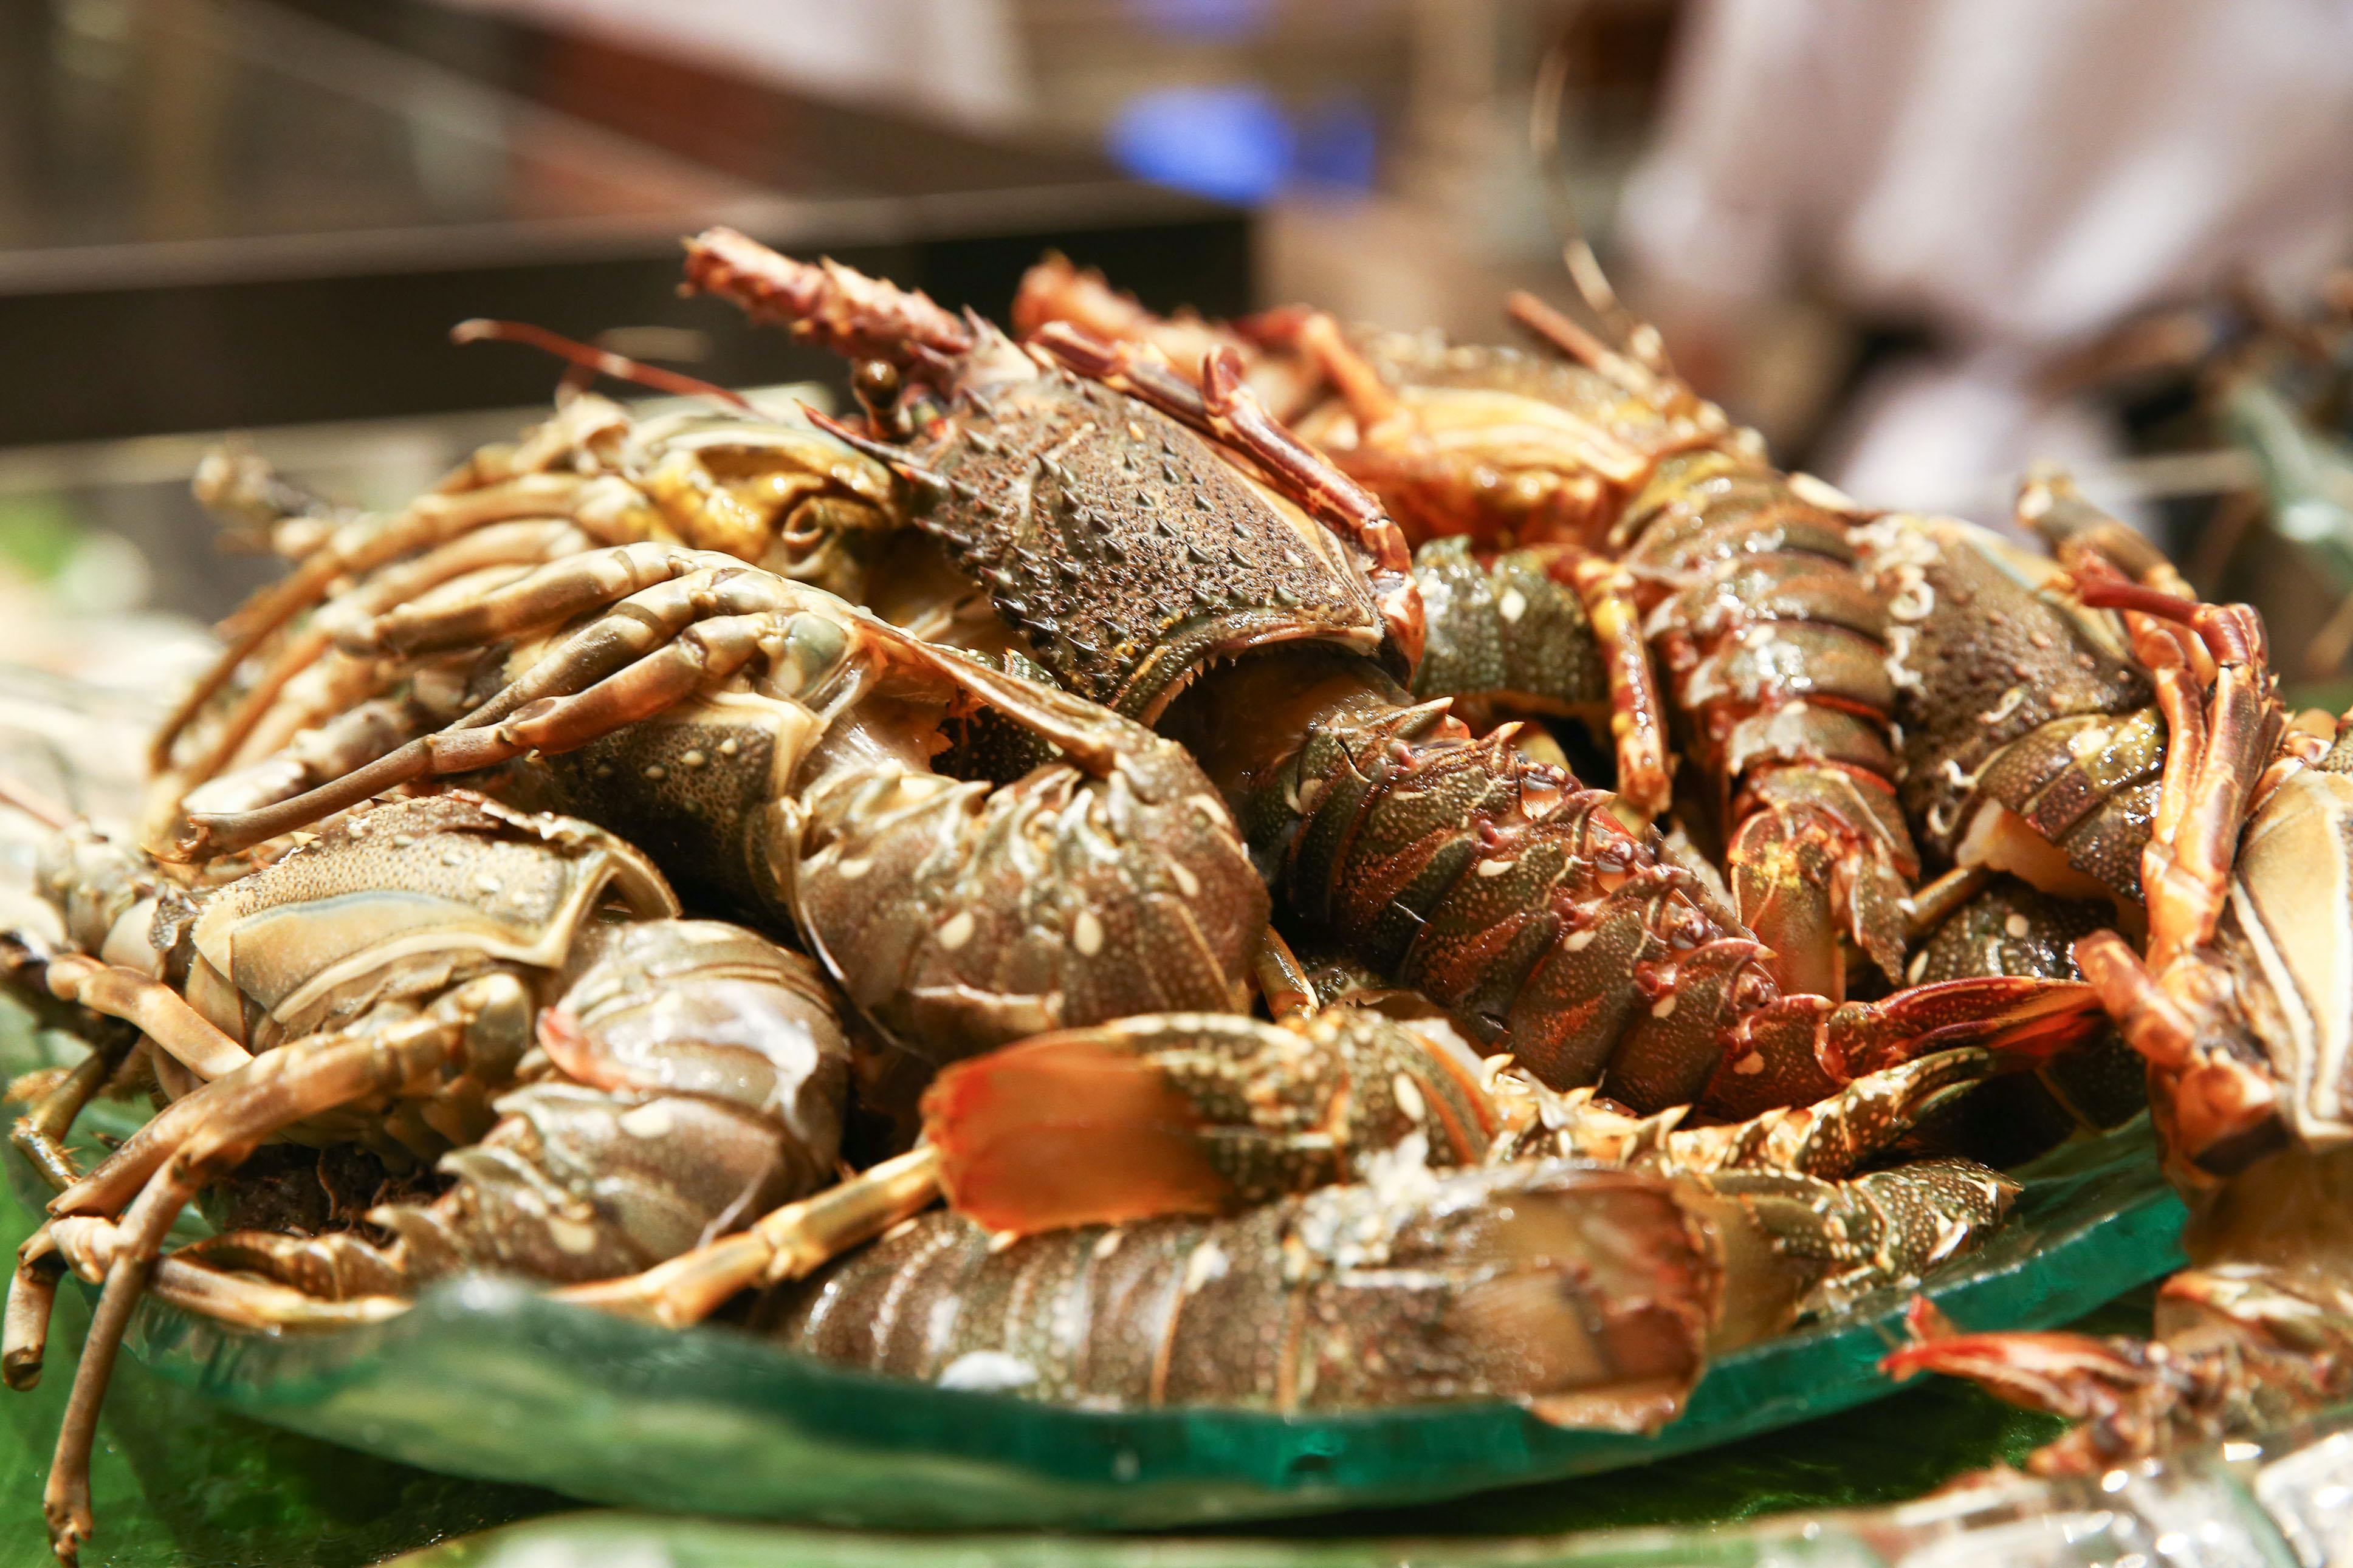 Sheraton Saigon - ẩm thực Tết sepecial menu - elle vietnam 2